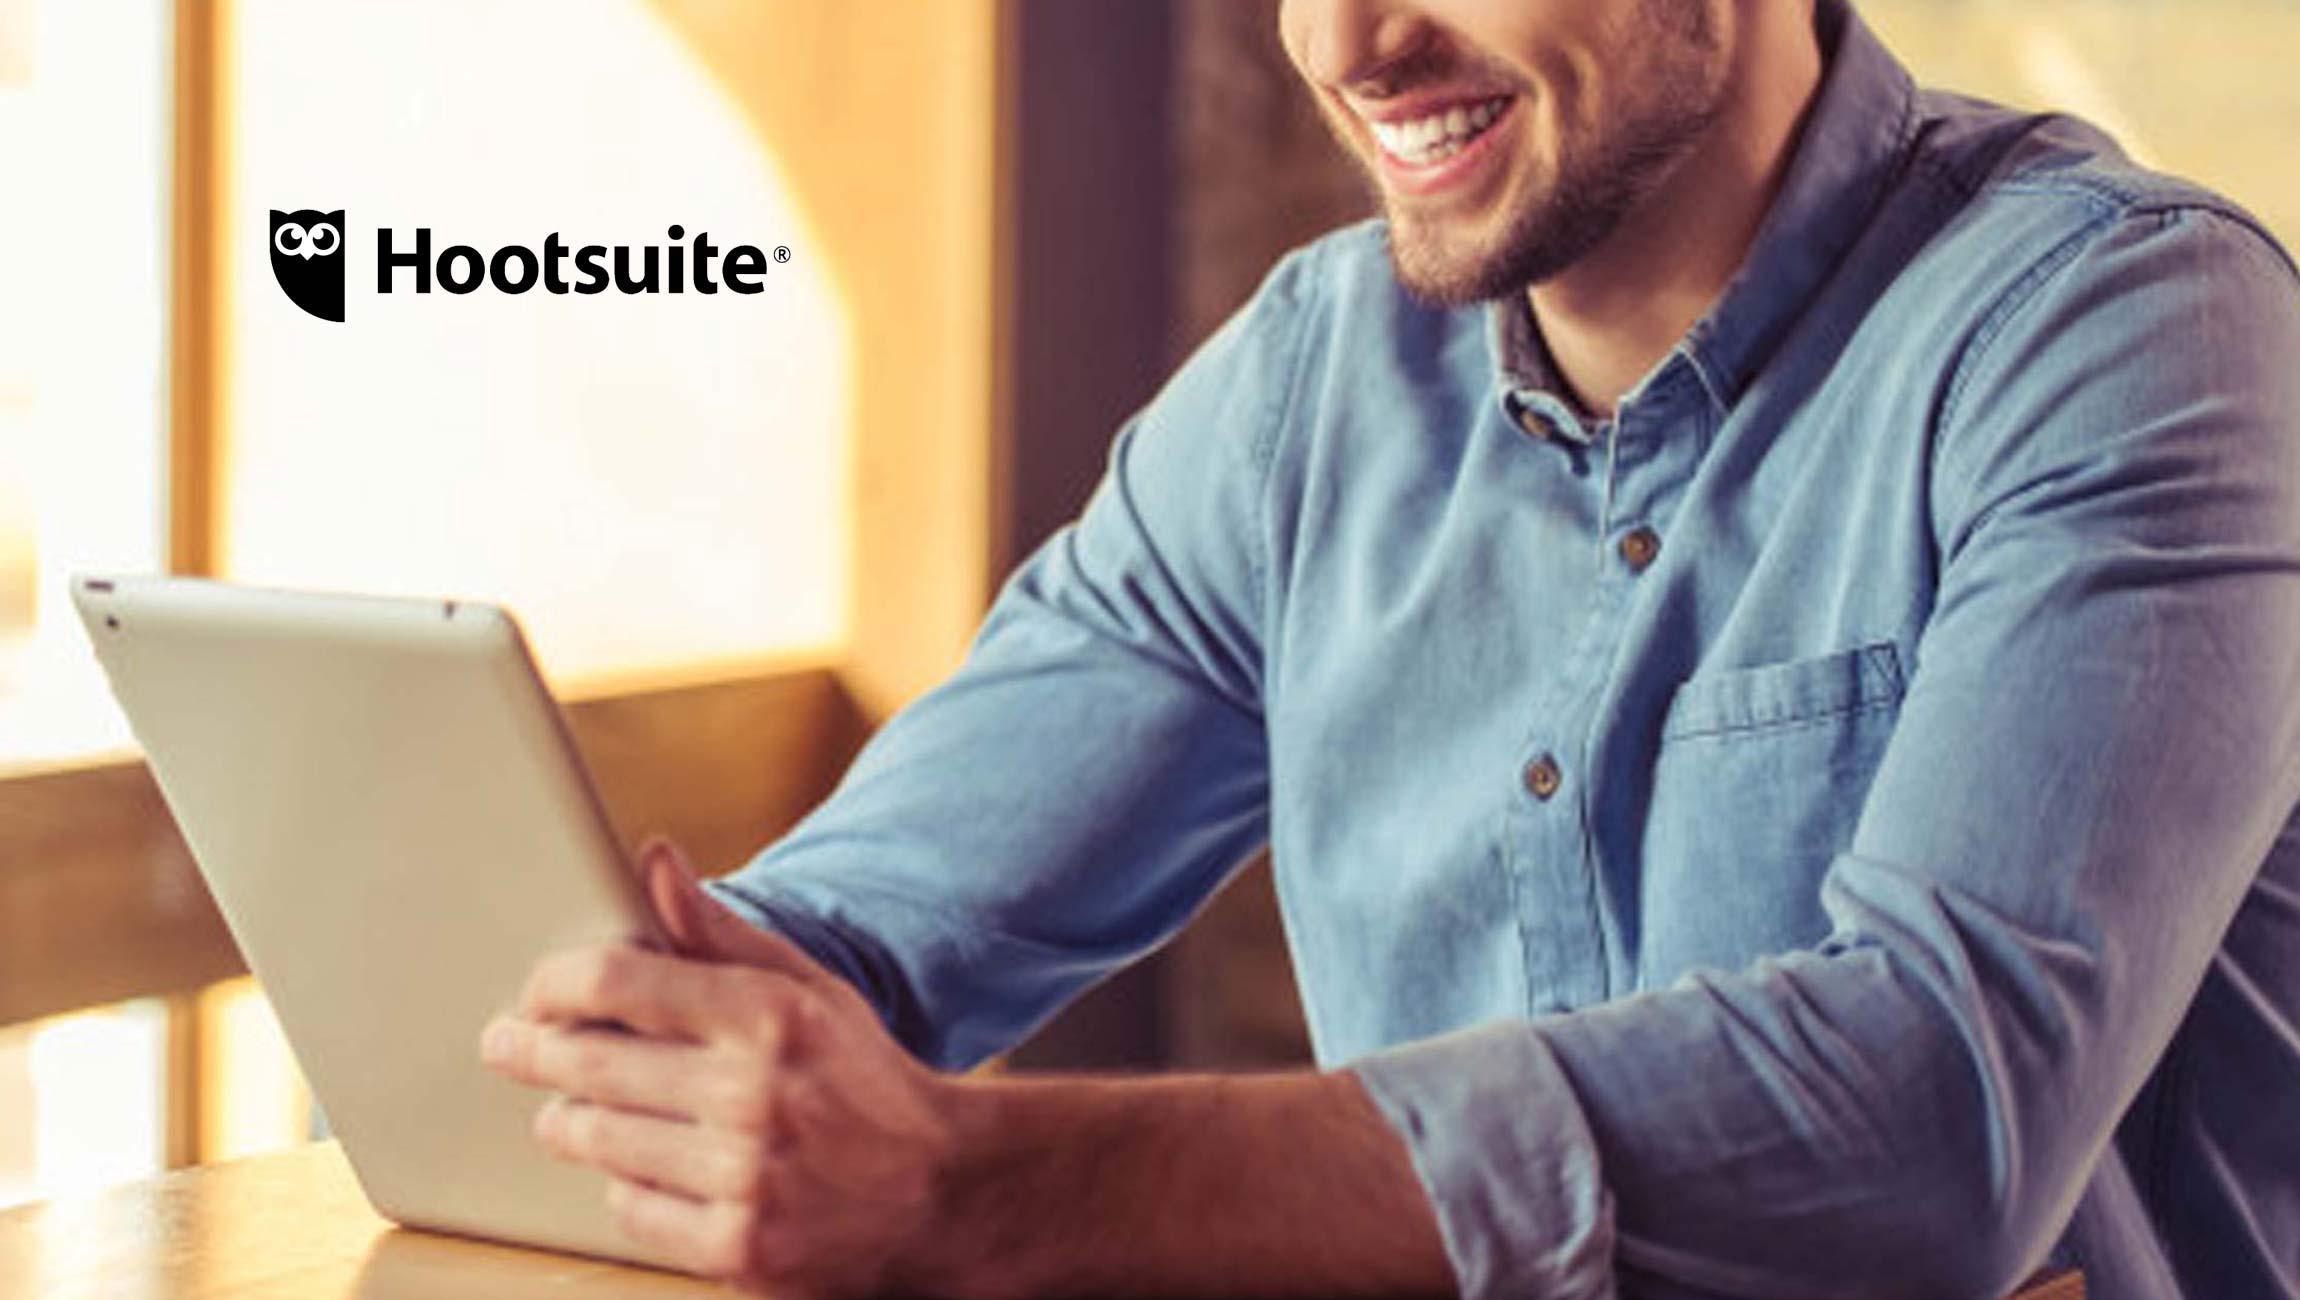 Hootsuite Welcomes New SVP of Software Development, Manish Kamra 1